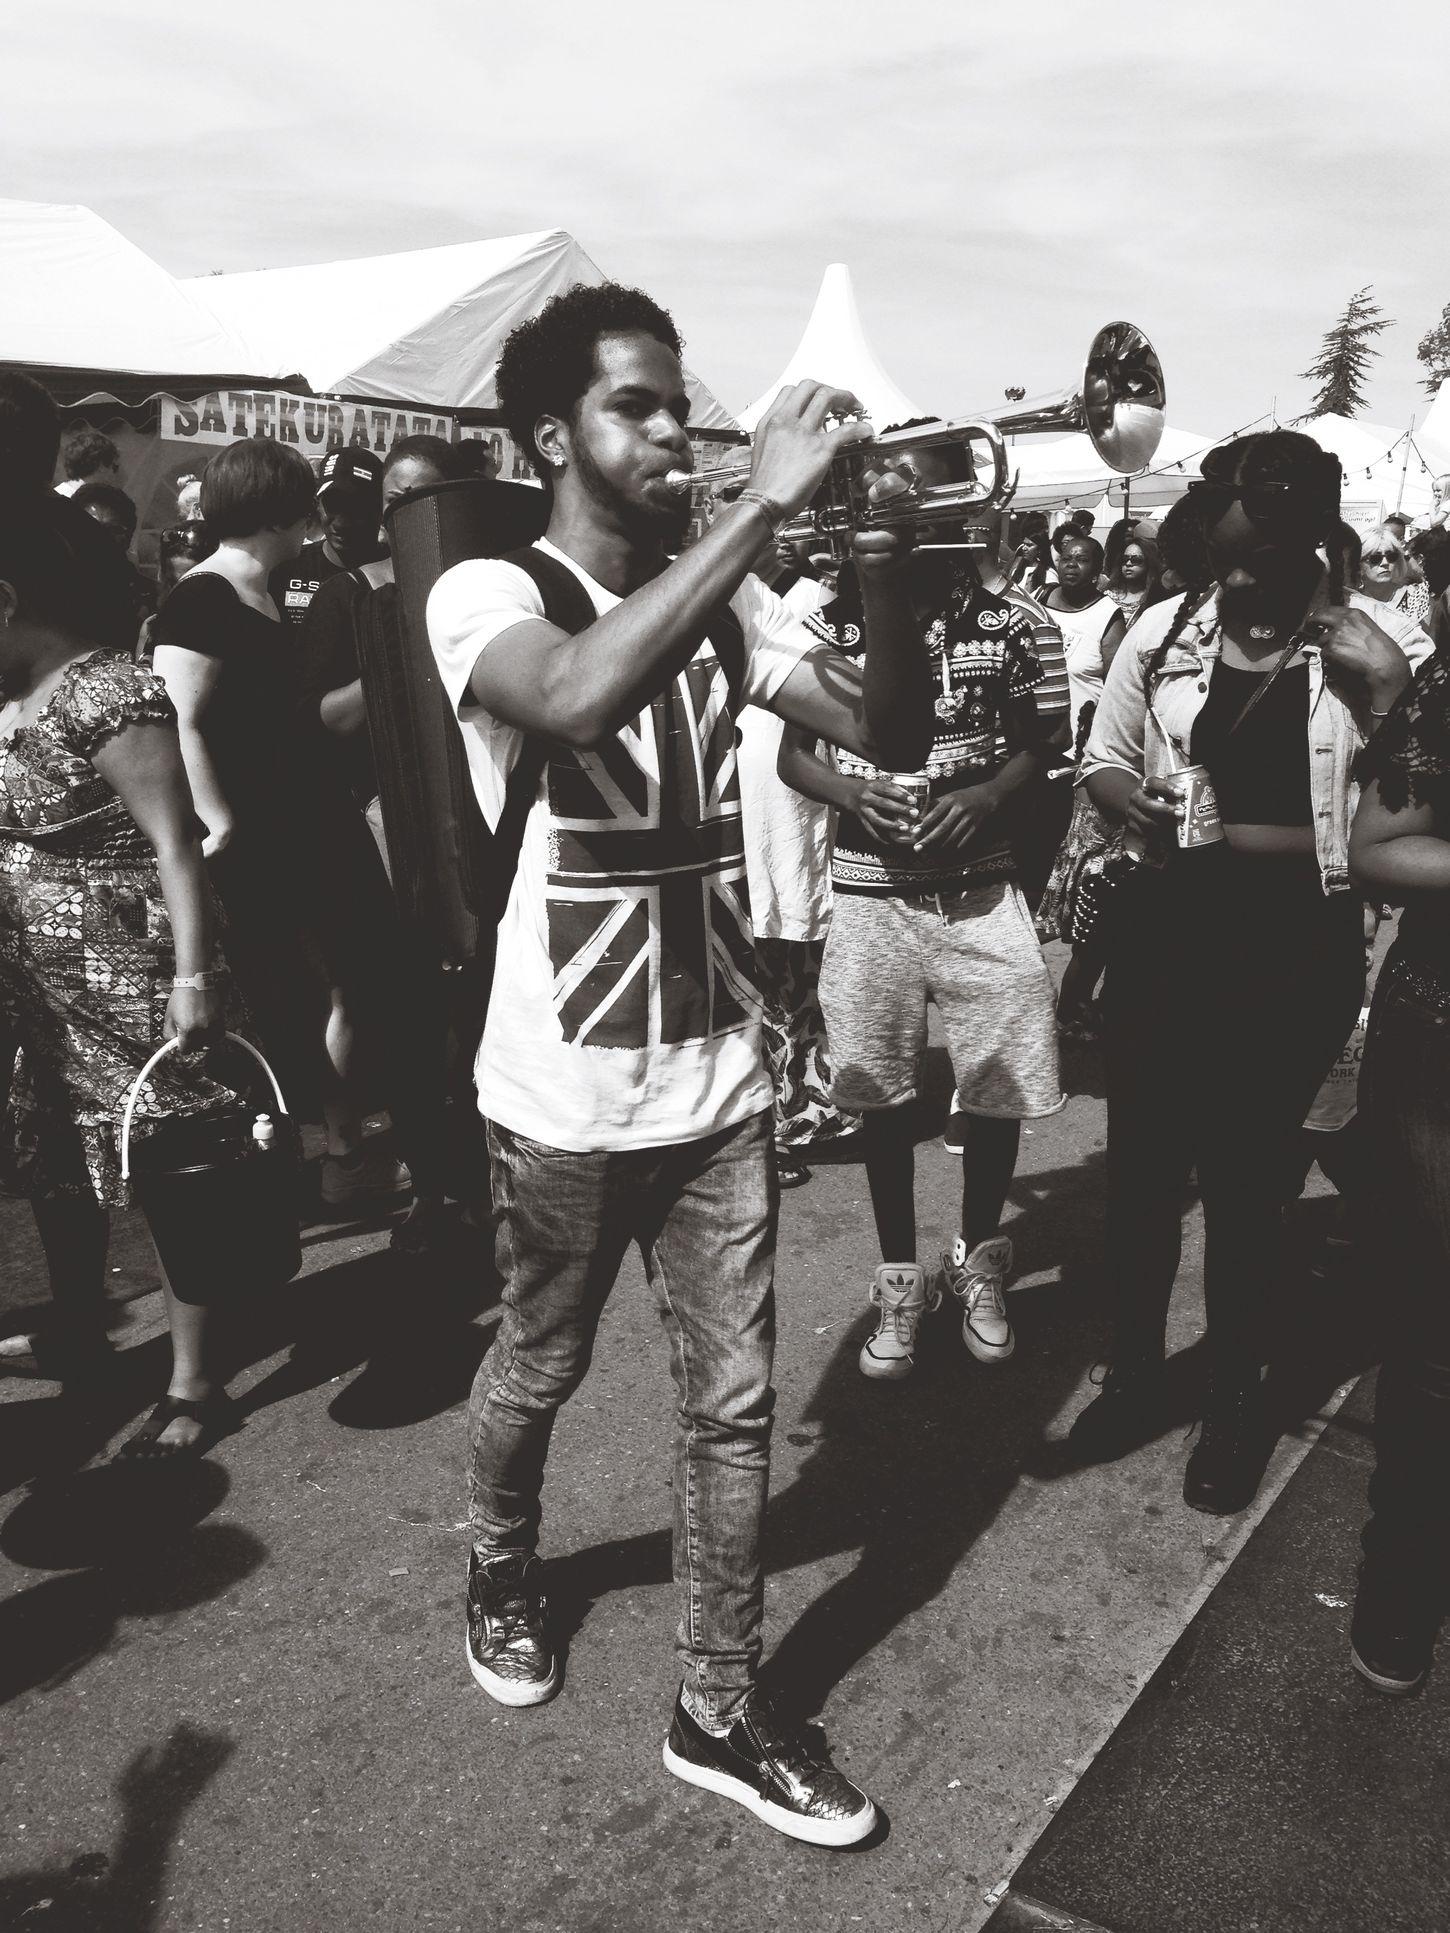 Kwakufestival Music Marching Band Summertime People Watching Blackandwhite